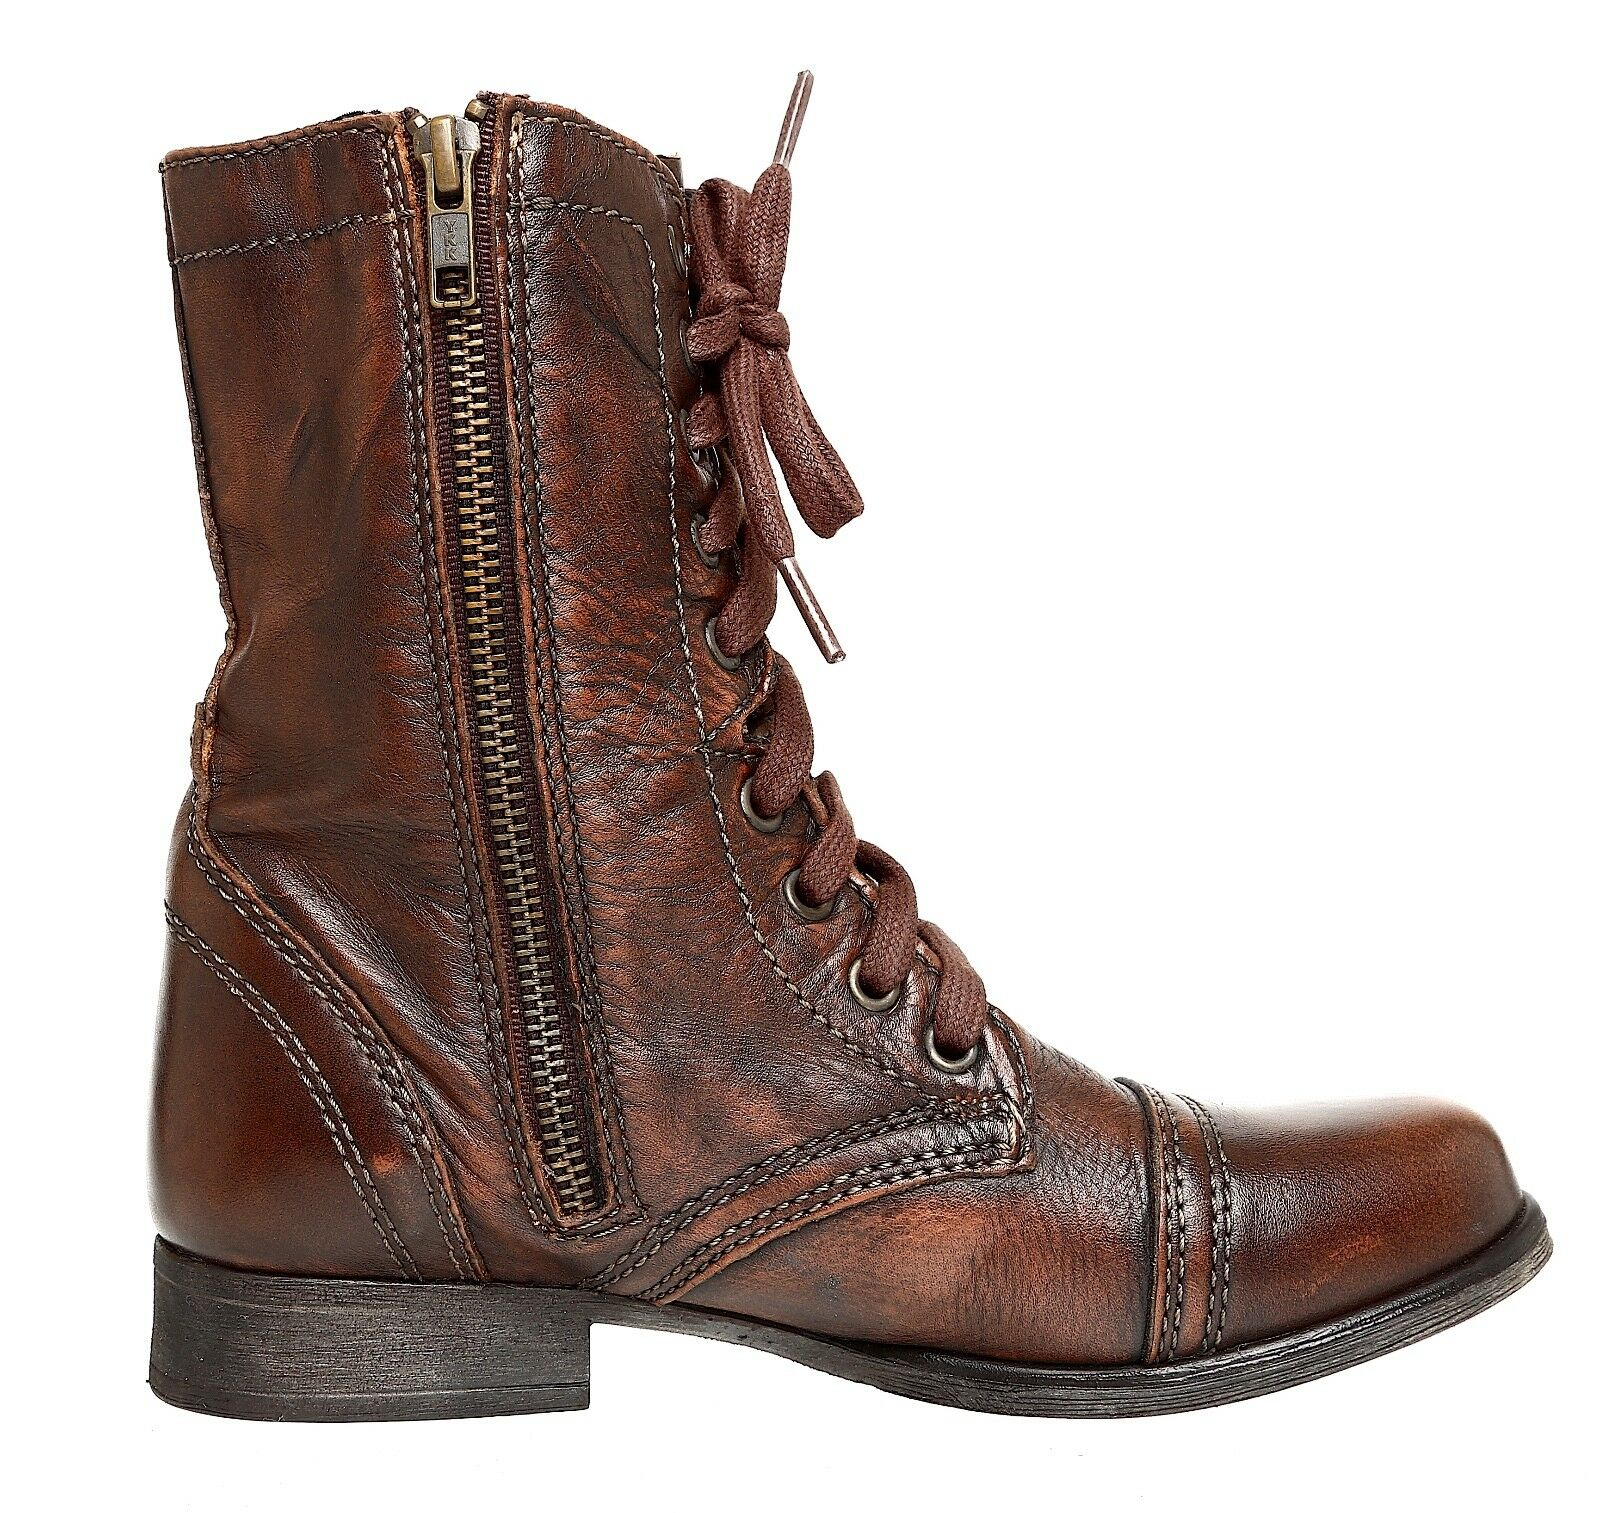 Steve Madden Troopa Leather Stiefel braun damen Sz 6.5 M M M 4023  3ddd54